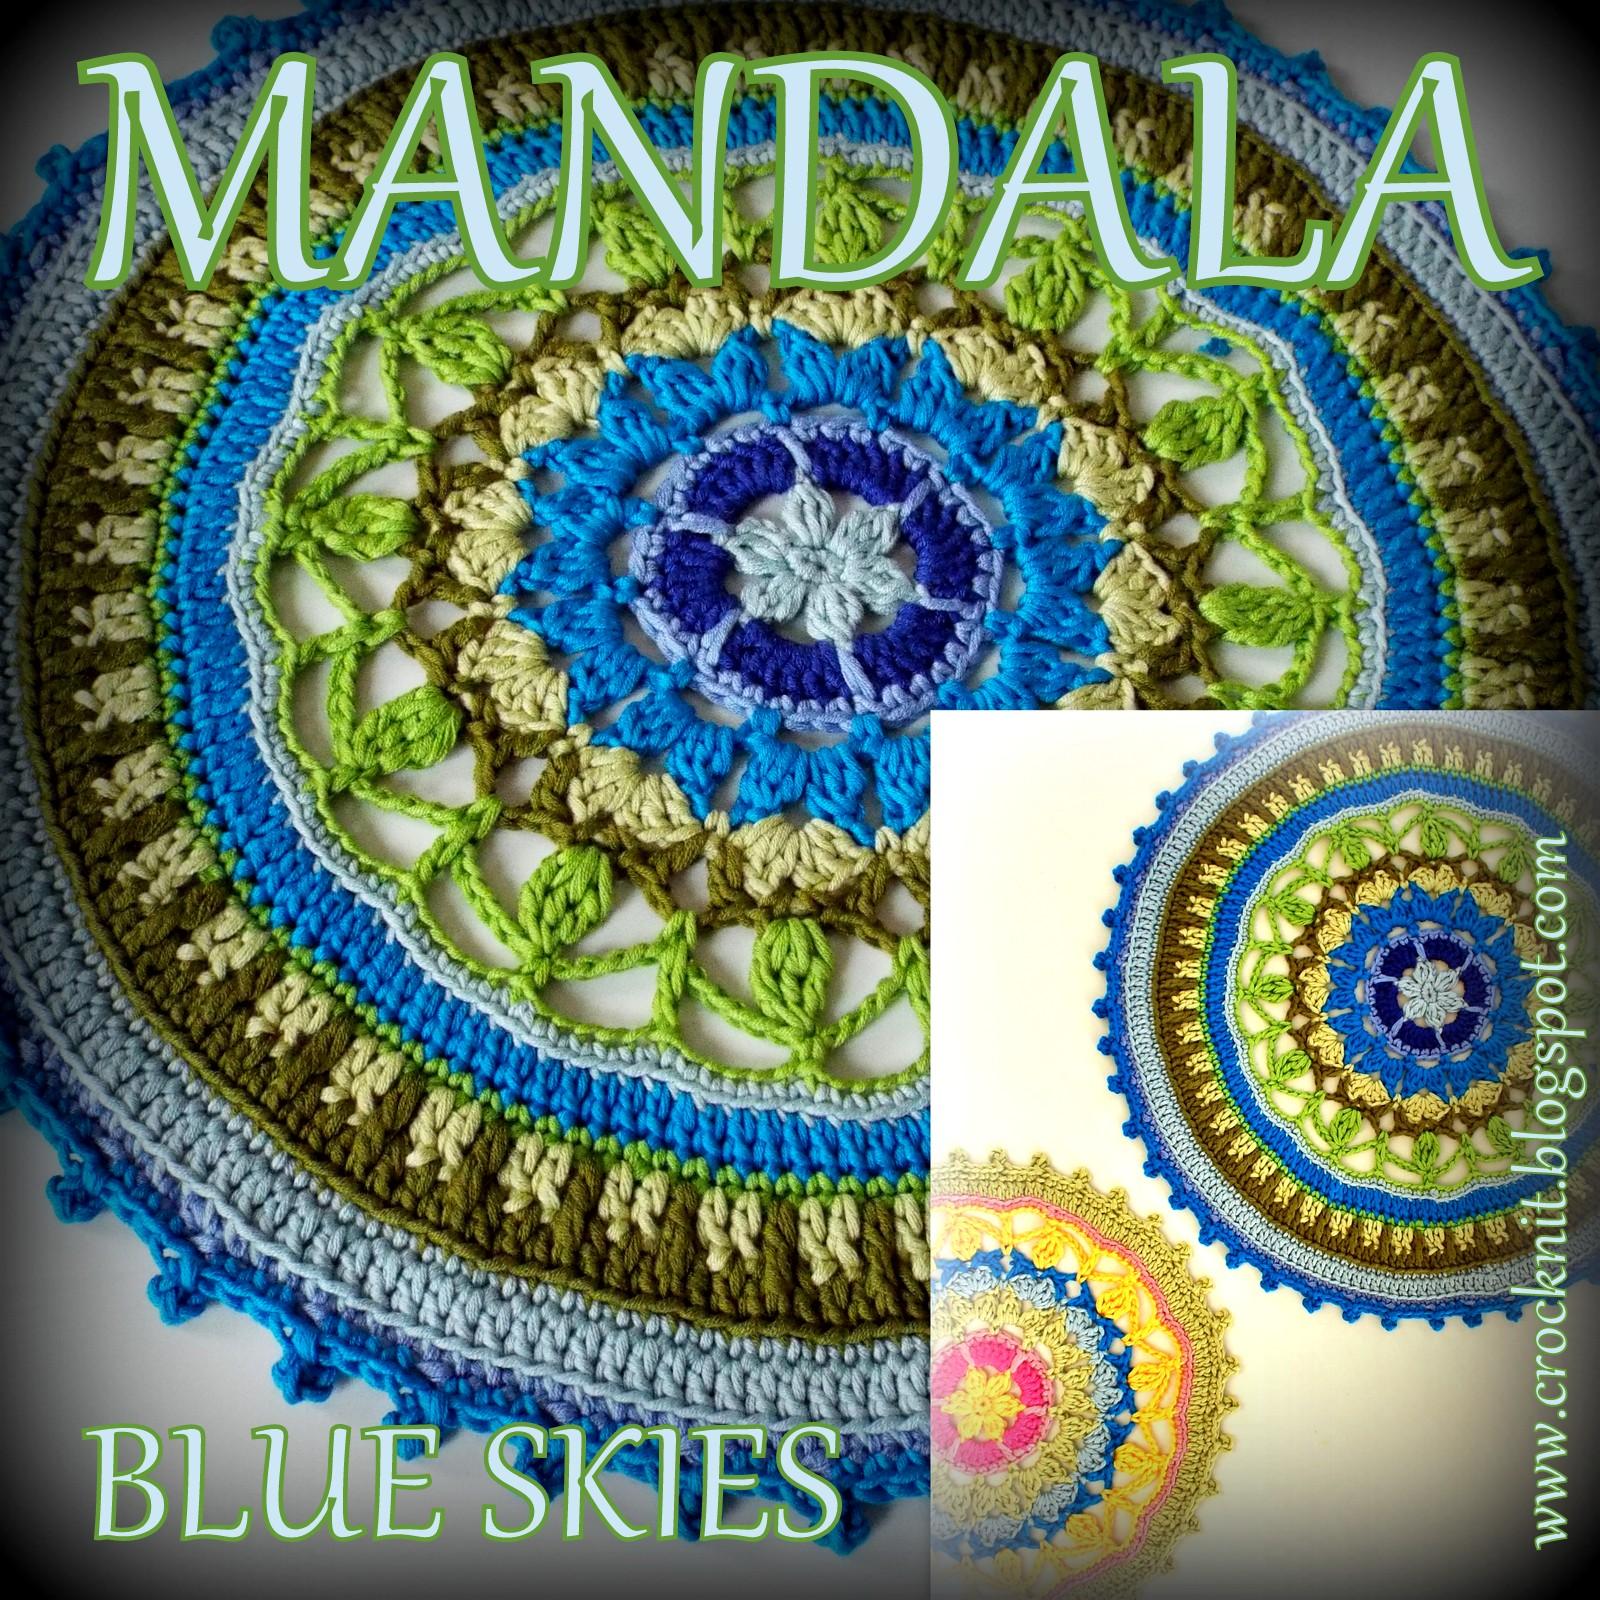 Crochet Patterns For Mandala Yarn : MICROCKNIT CREATIONS: MANDALA Blue Skies Crochet Pattern